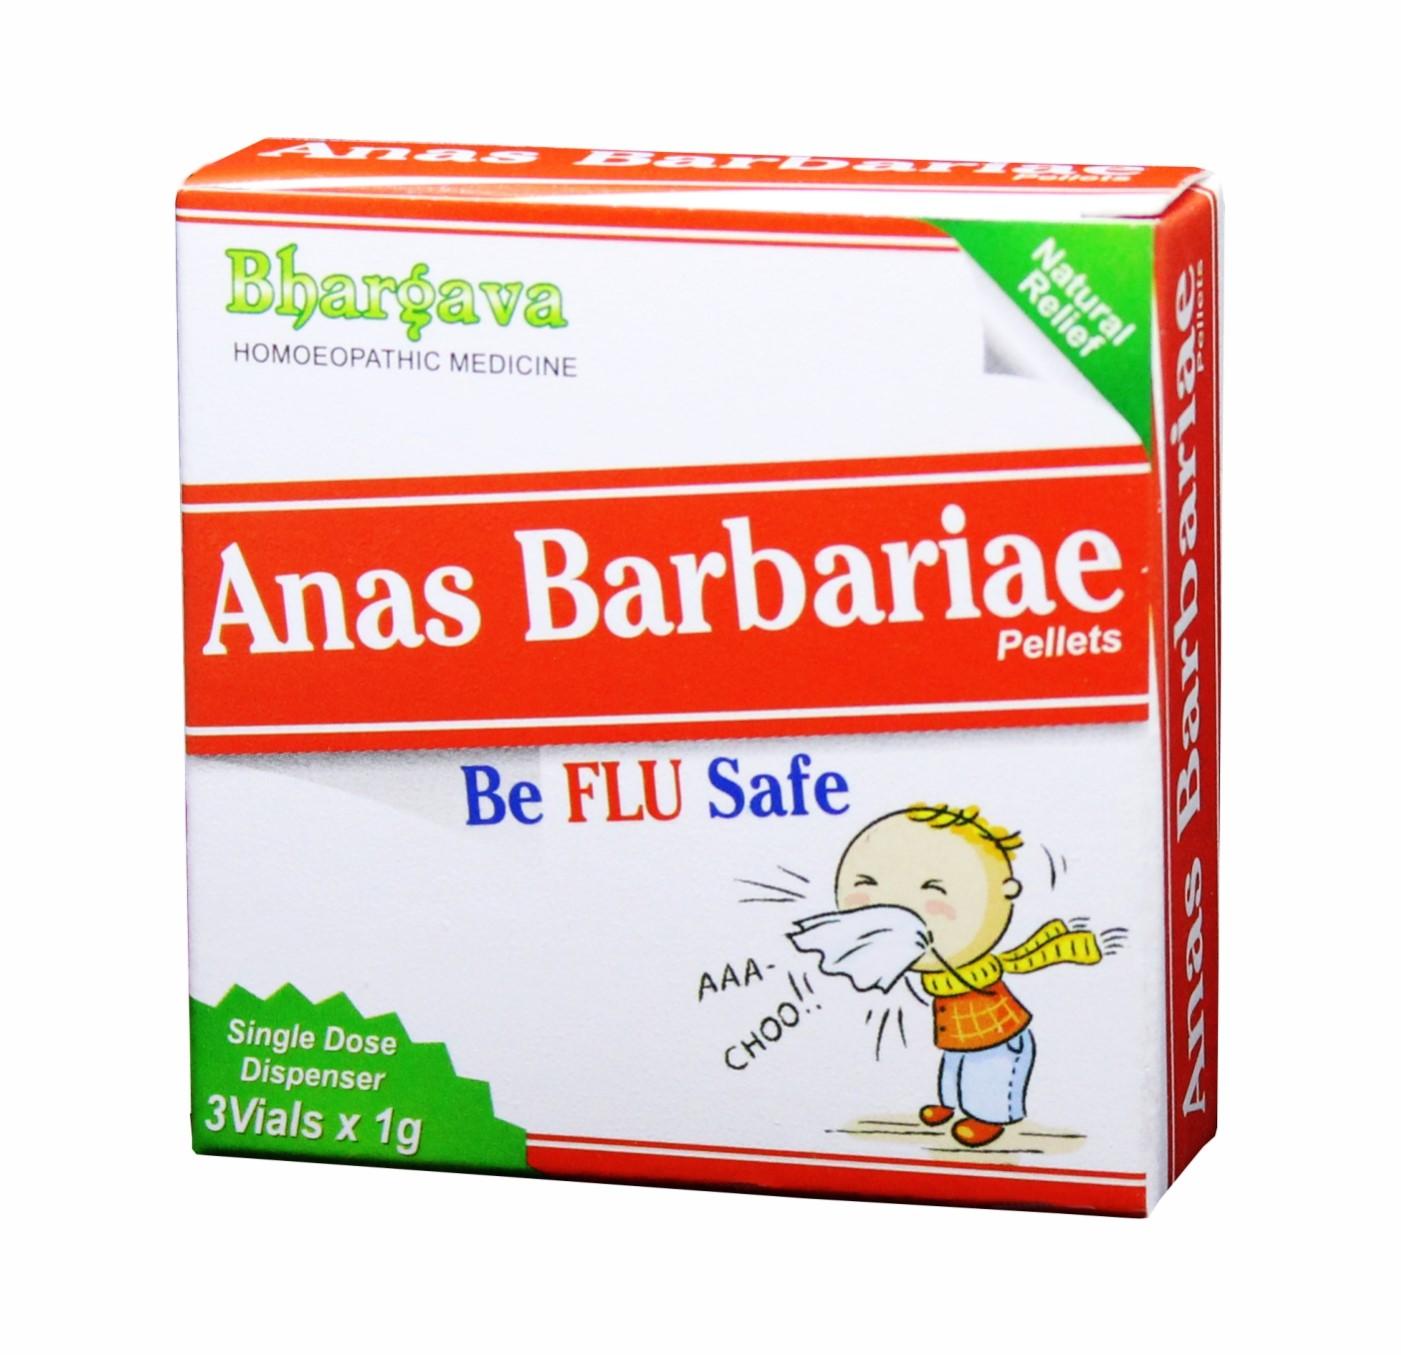 Anas Barbariae Fever & Flu Safe  style=